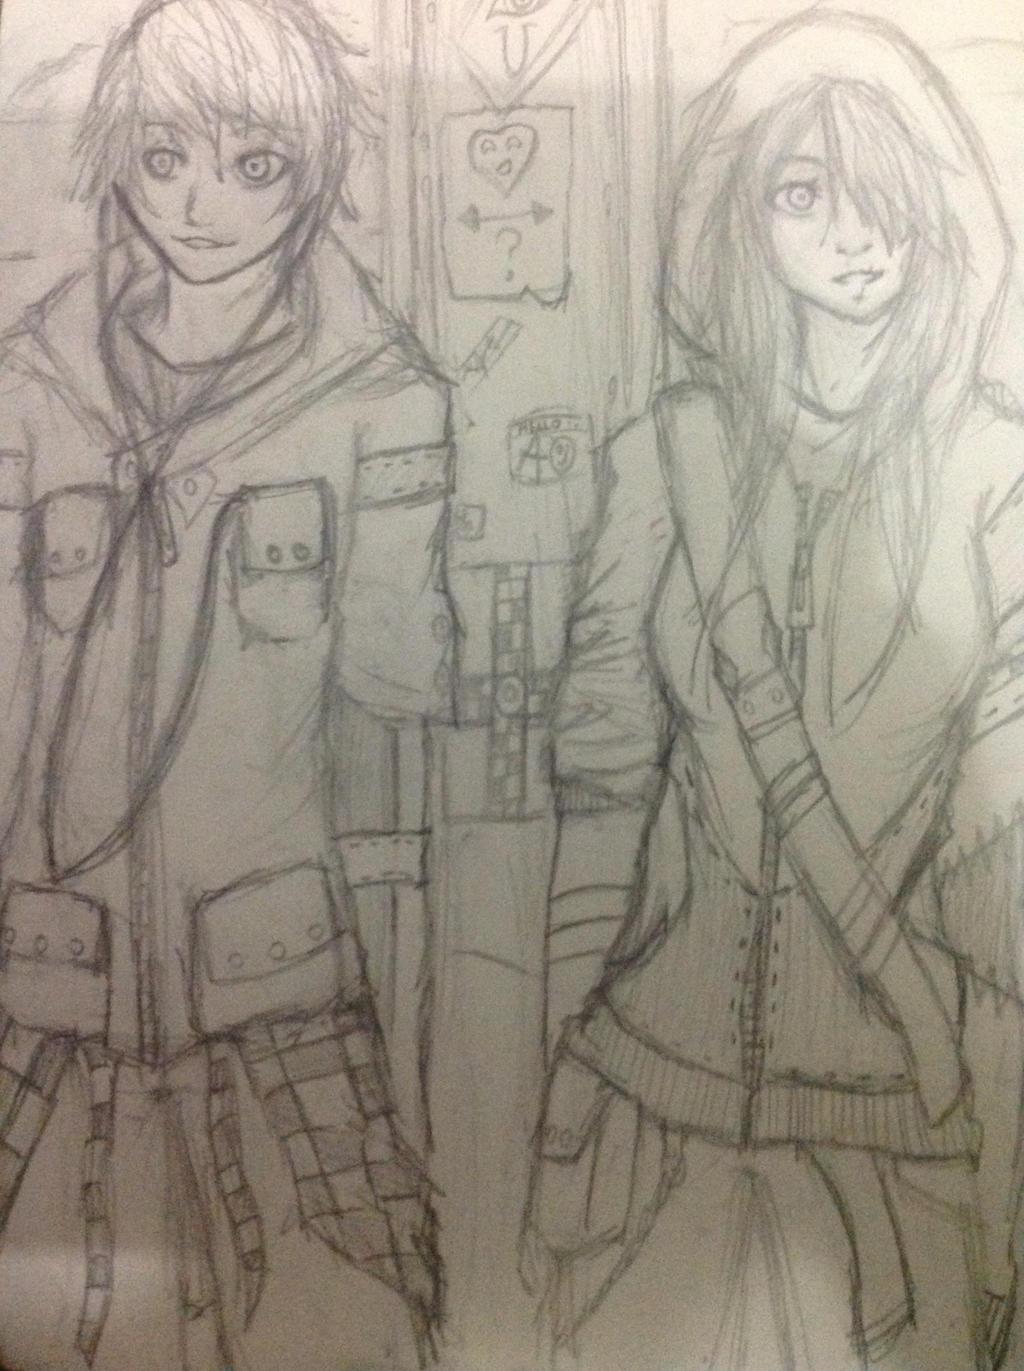 Just standing here....chilling by Demon-Shinob1